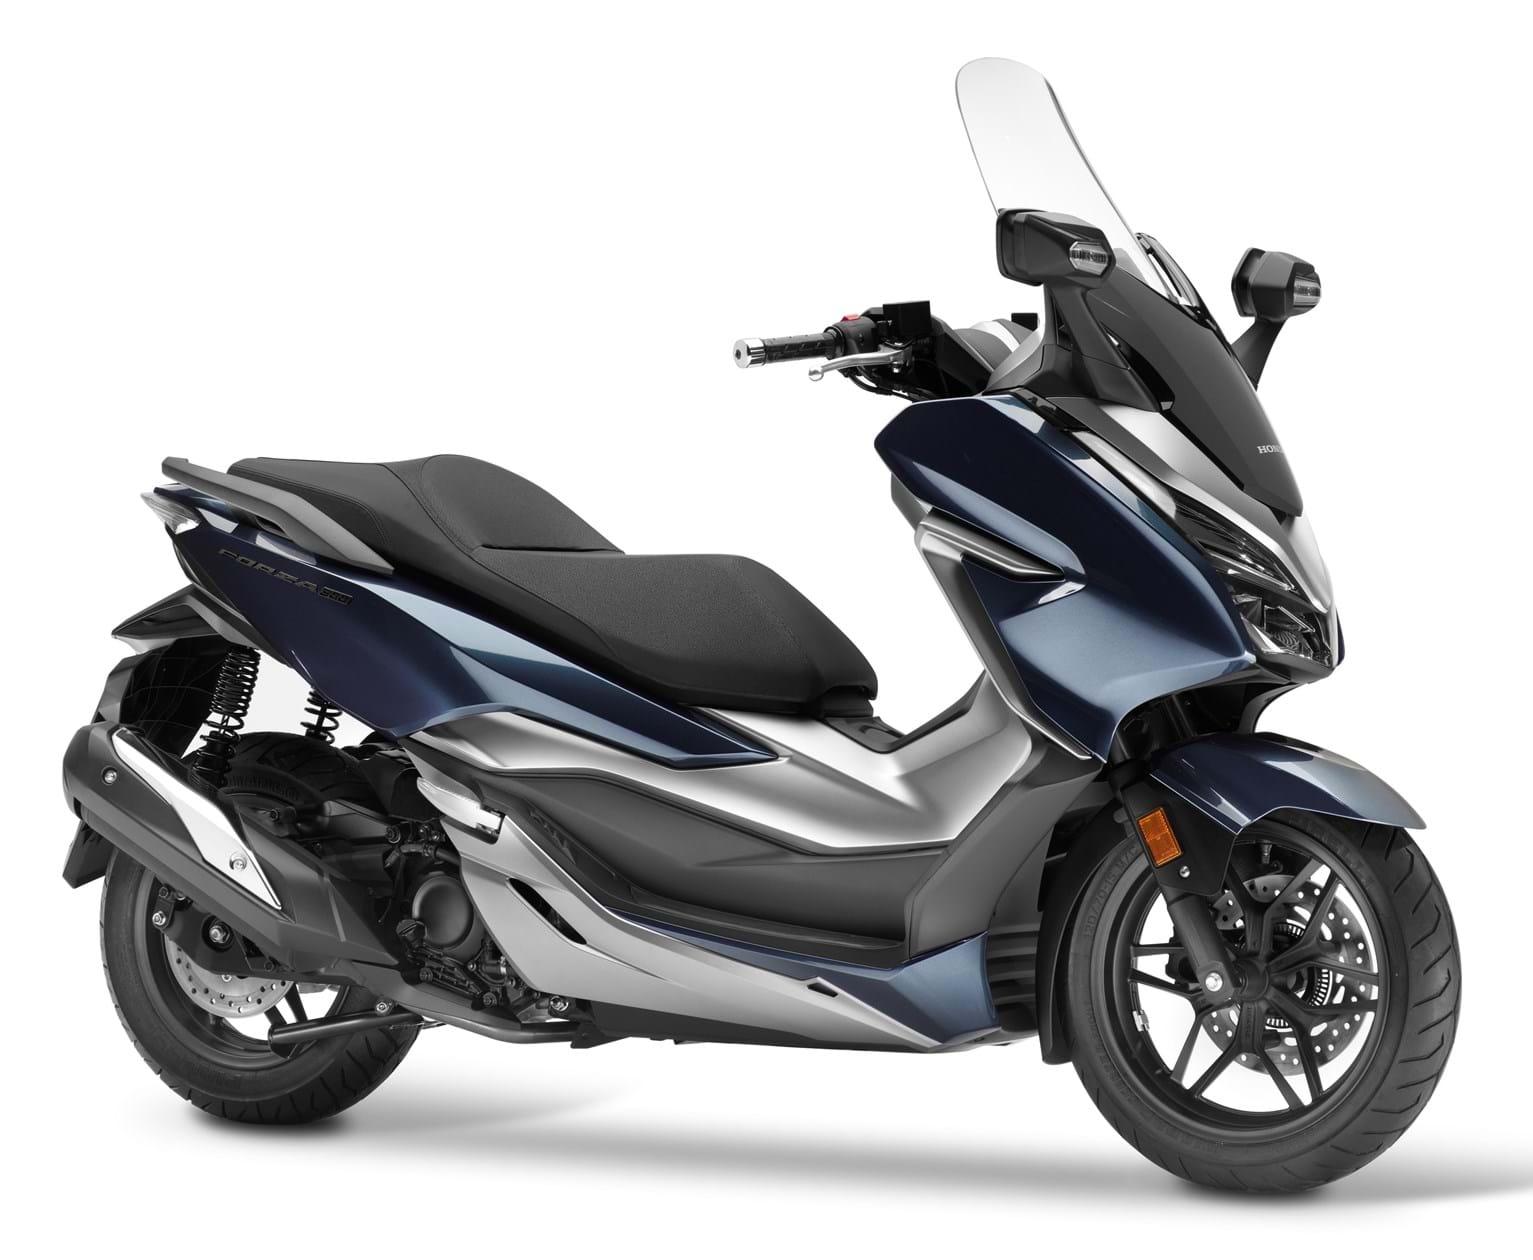 For Sale Honda Forza 300 The Bike Market